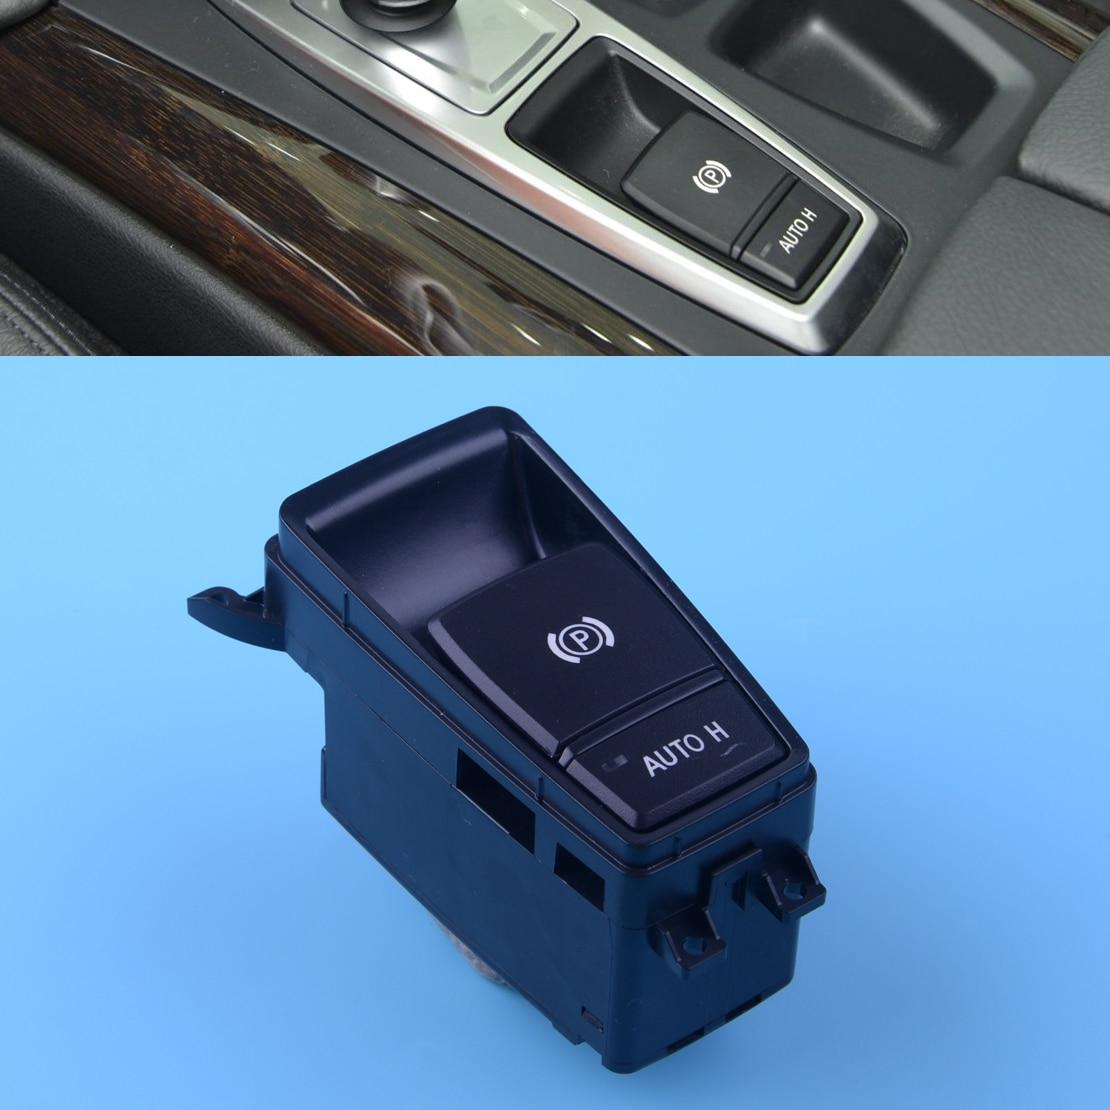 61319148508 FOR BMW X5 X6 E70 E71 E72 HANDBRAKE PARKING BRAKE AUTO H HOLD SWITCH